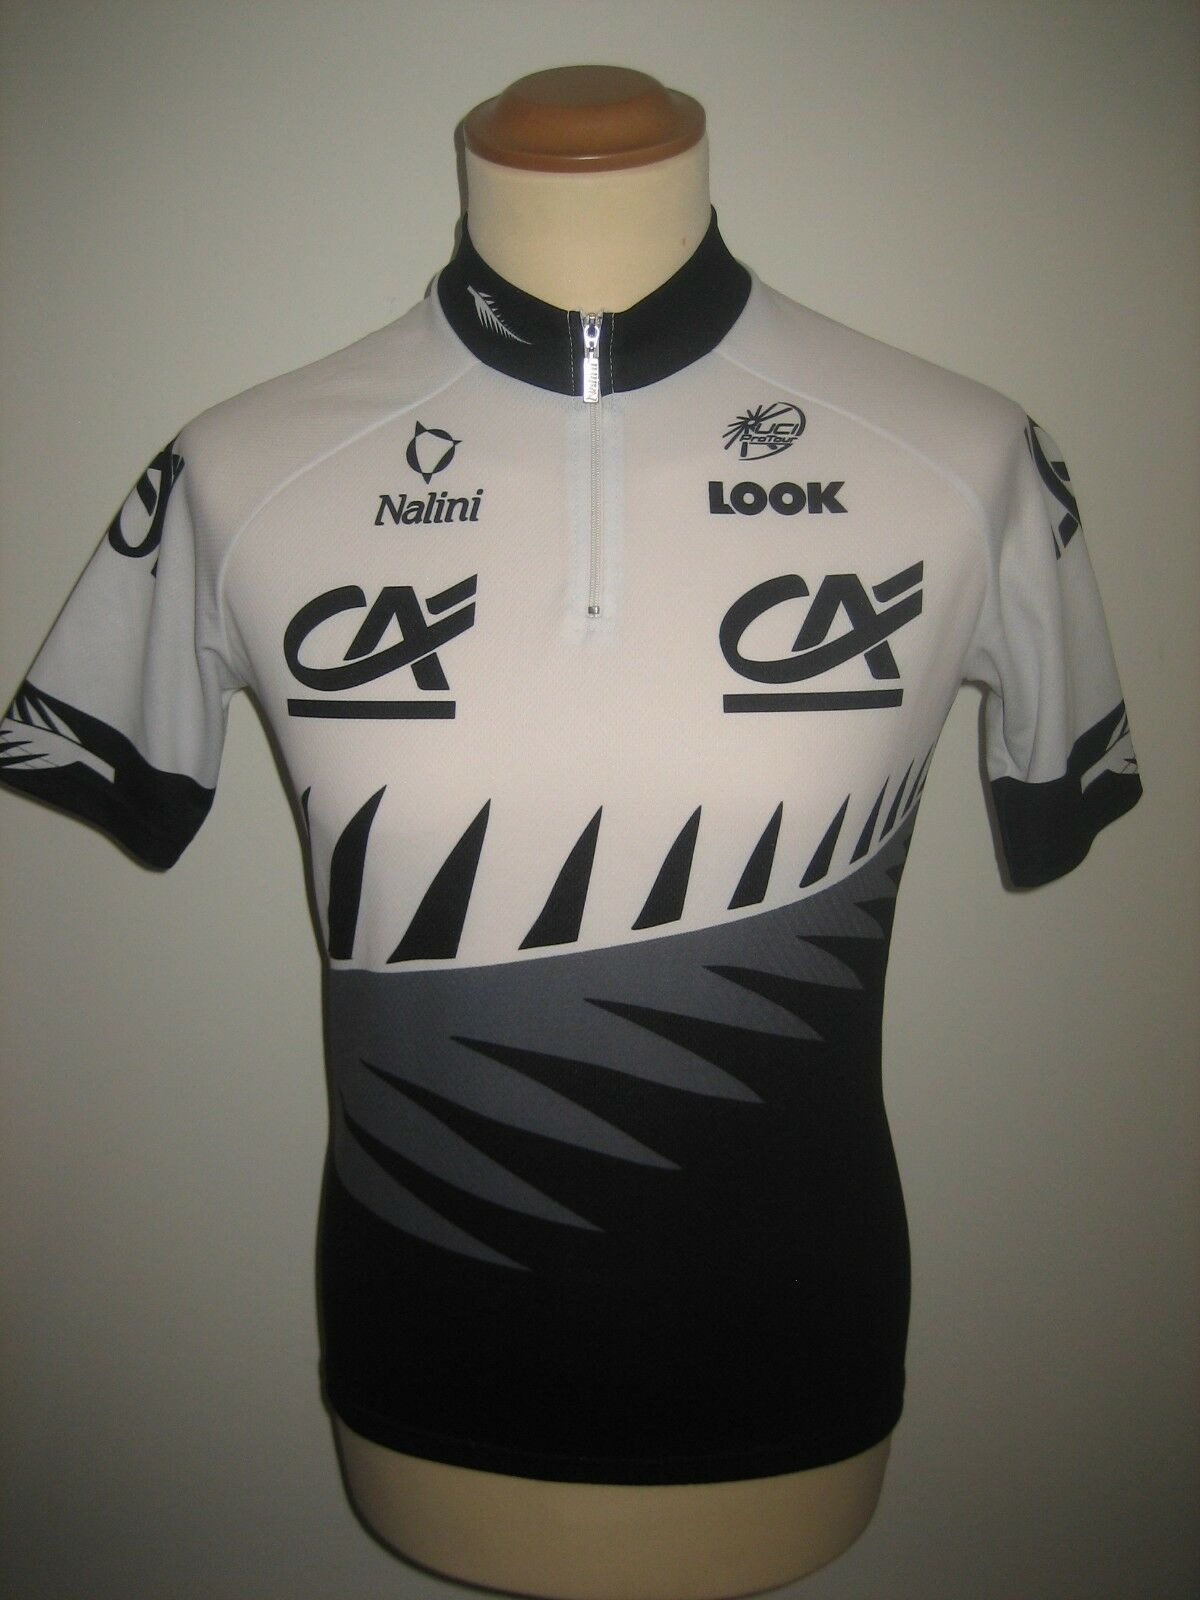 CROTit maillot Agricole Julian DEAN jersey shirt cycling trikot maglia maillot CROTit Größe S 9e87b6